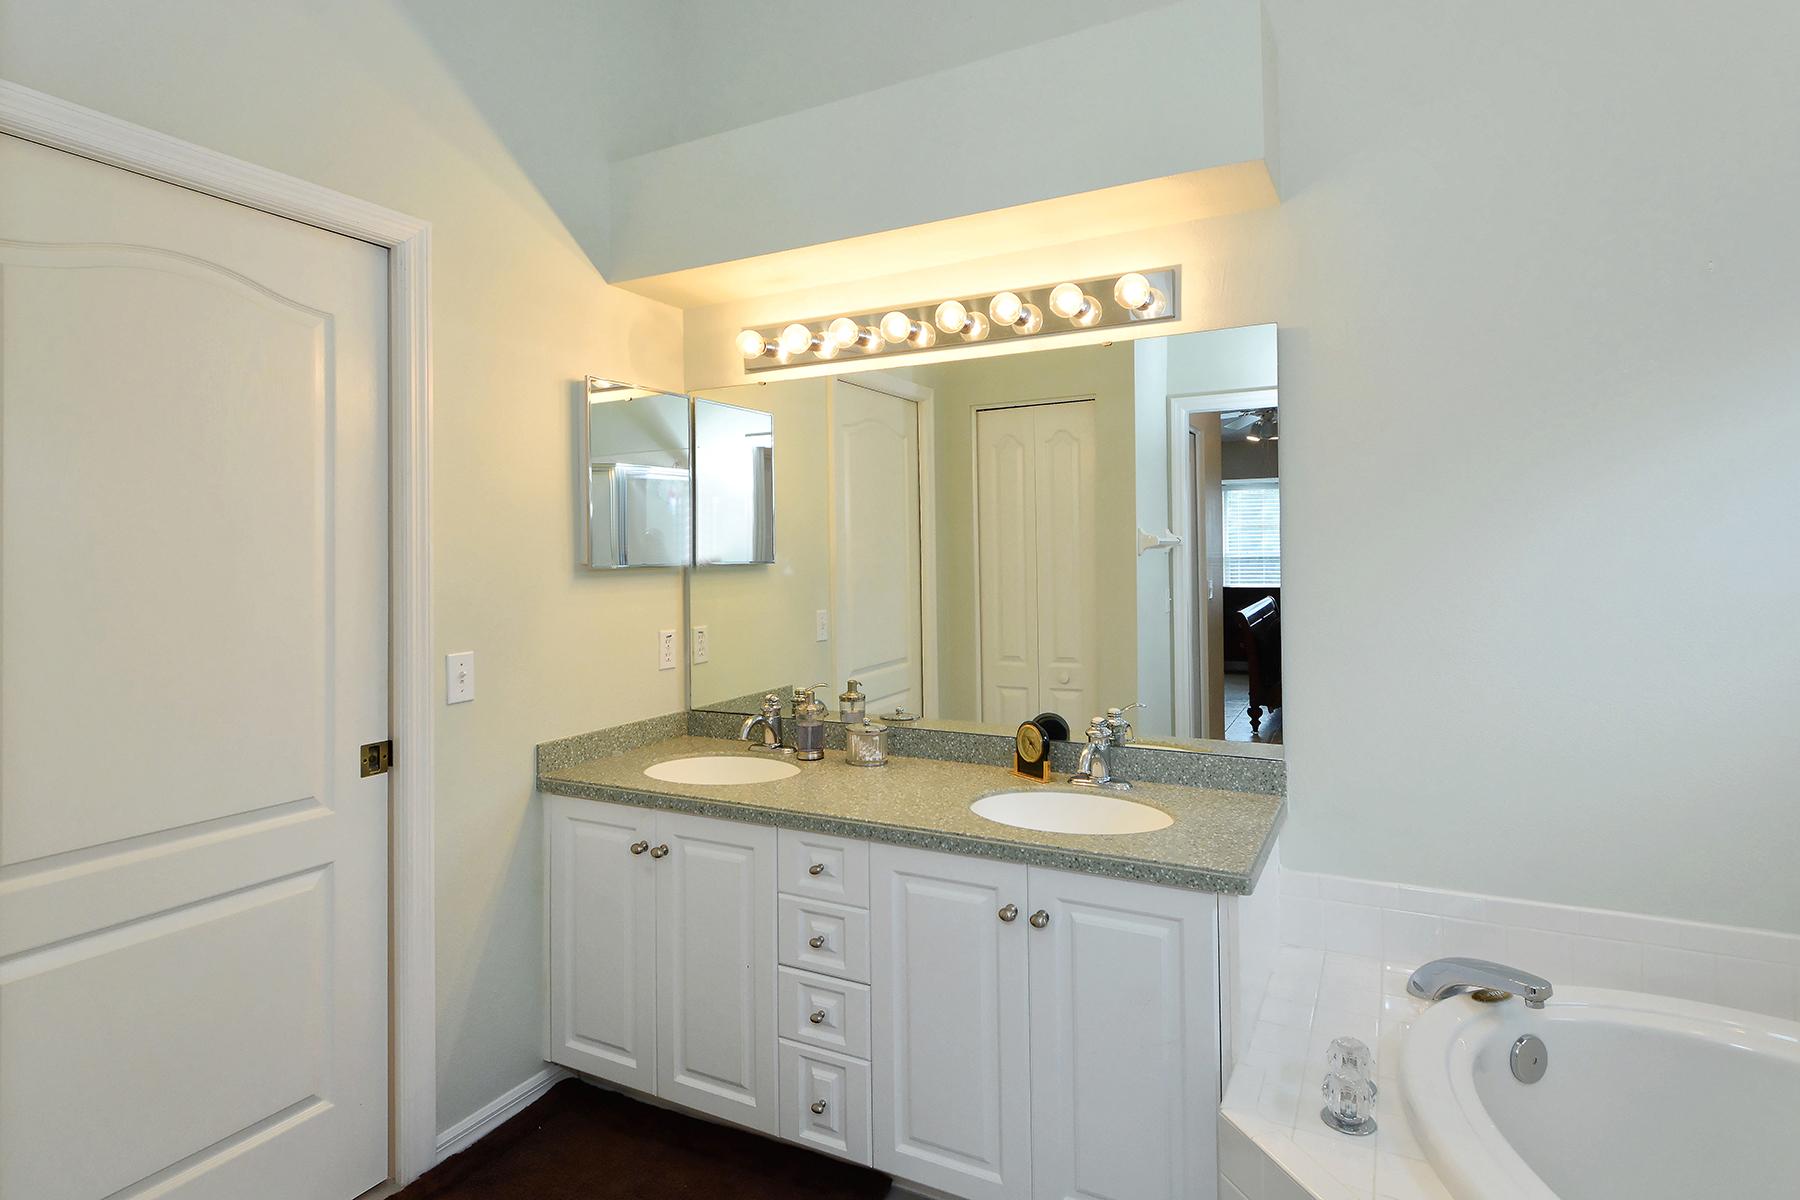 Additional photo for property listing at SARASOTA 9611  Castle Point Dr 921,  Sarasota, Florida 34238 United States